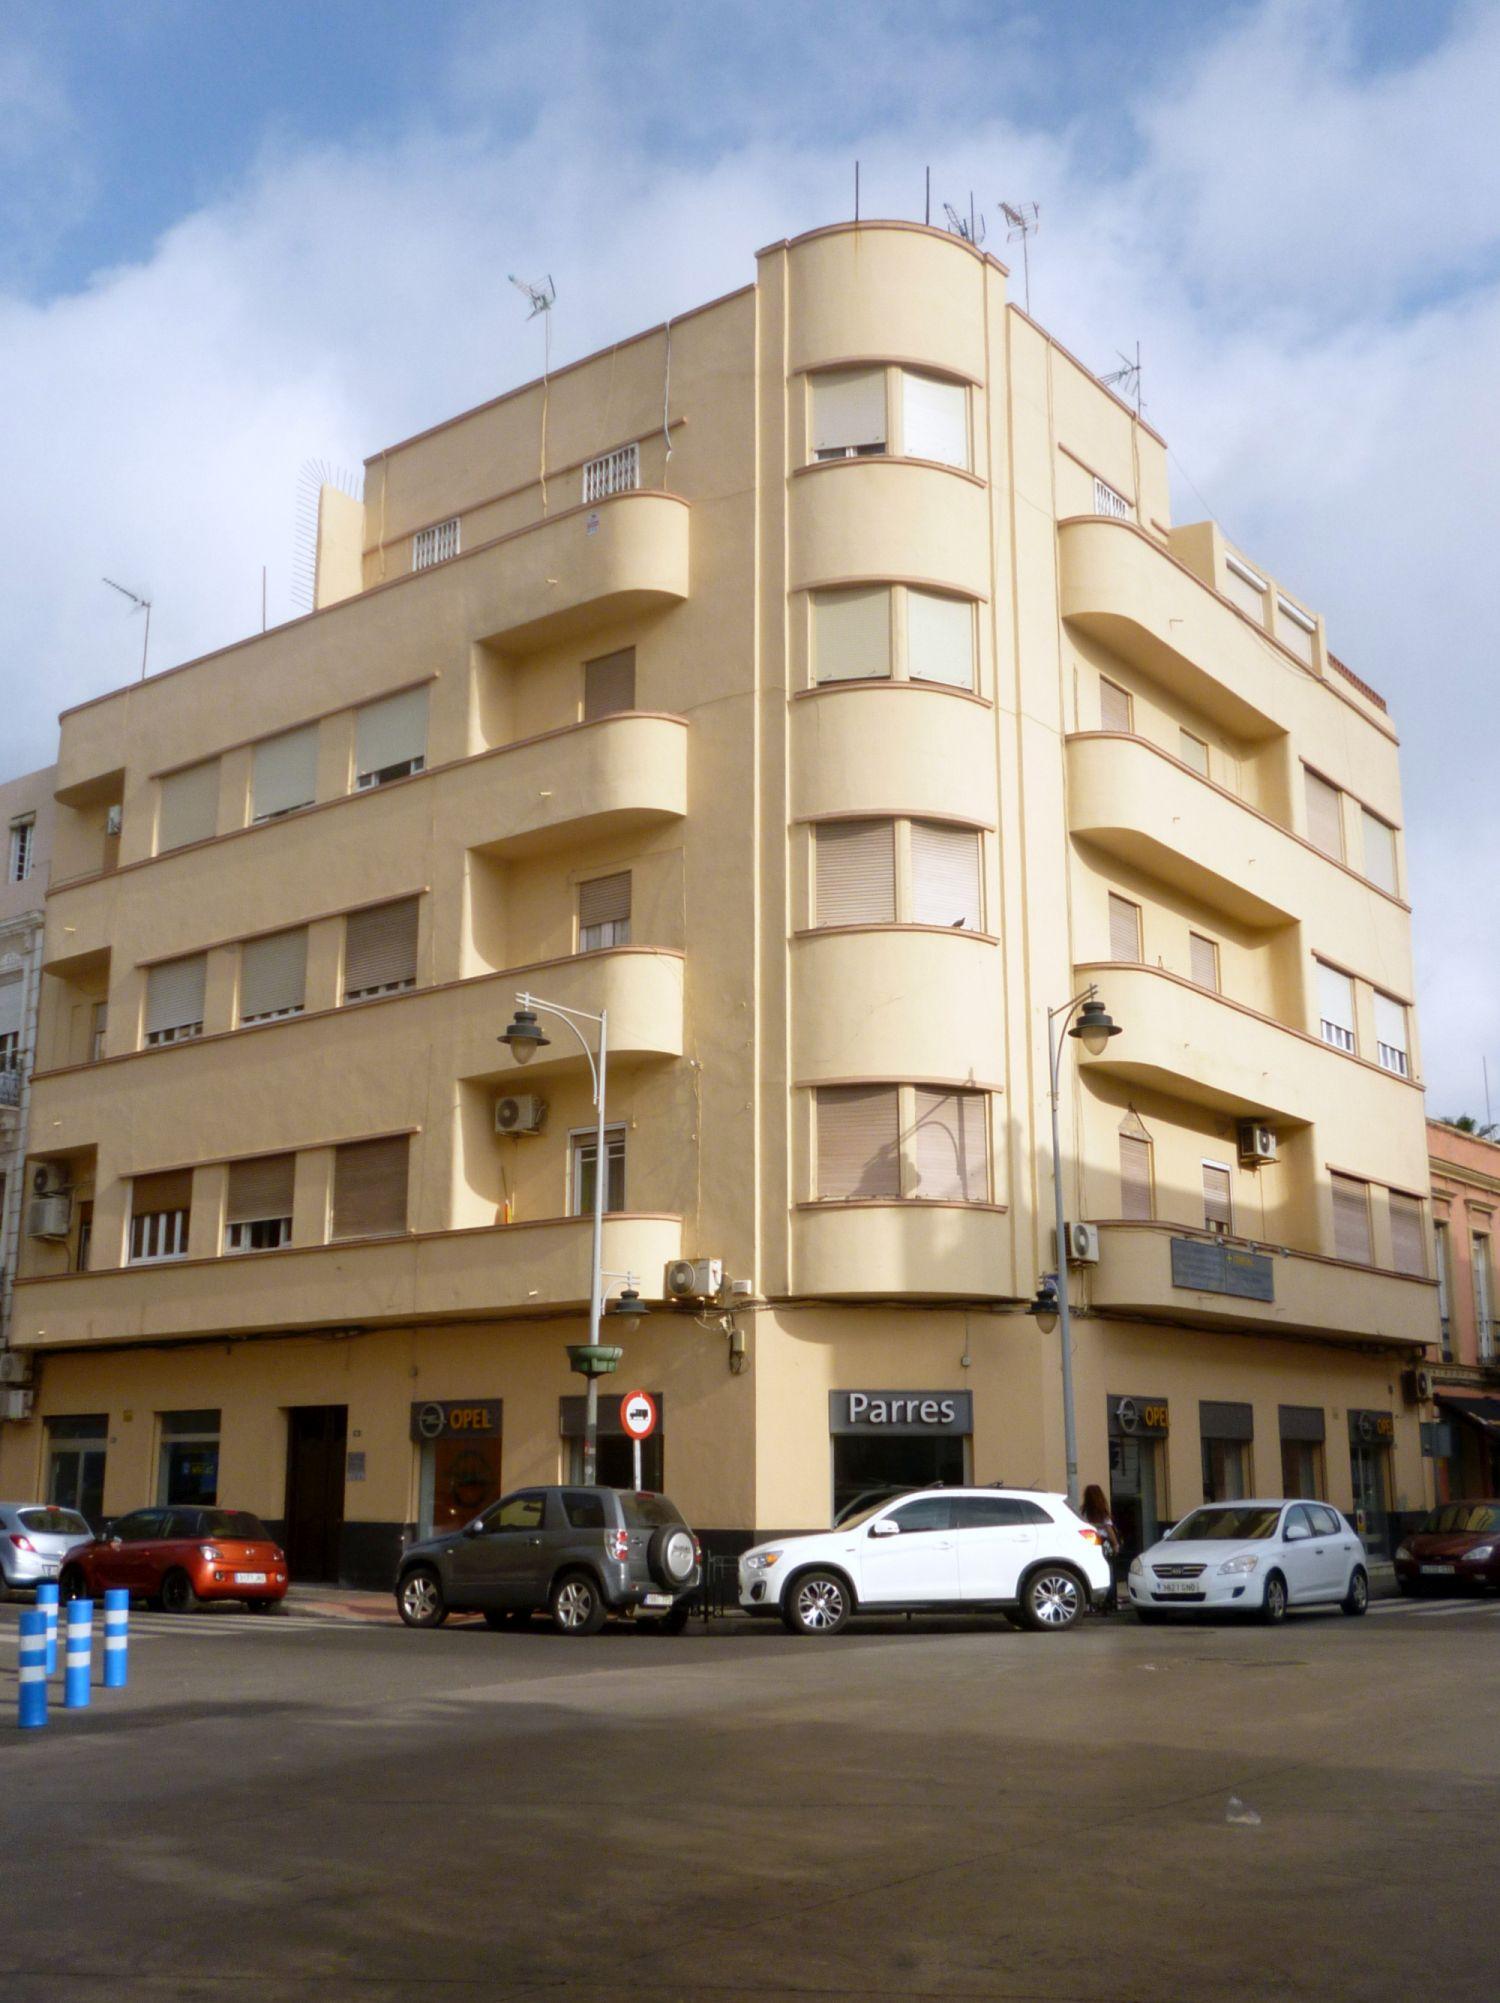 Casa de Juan Parres Puig (calle General O'Donnell, 41)